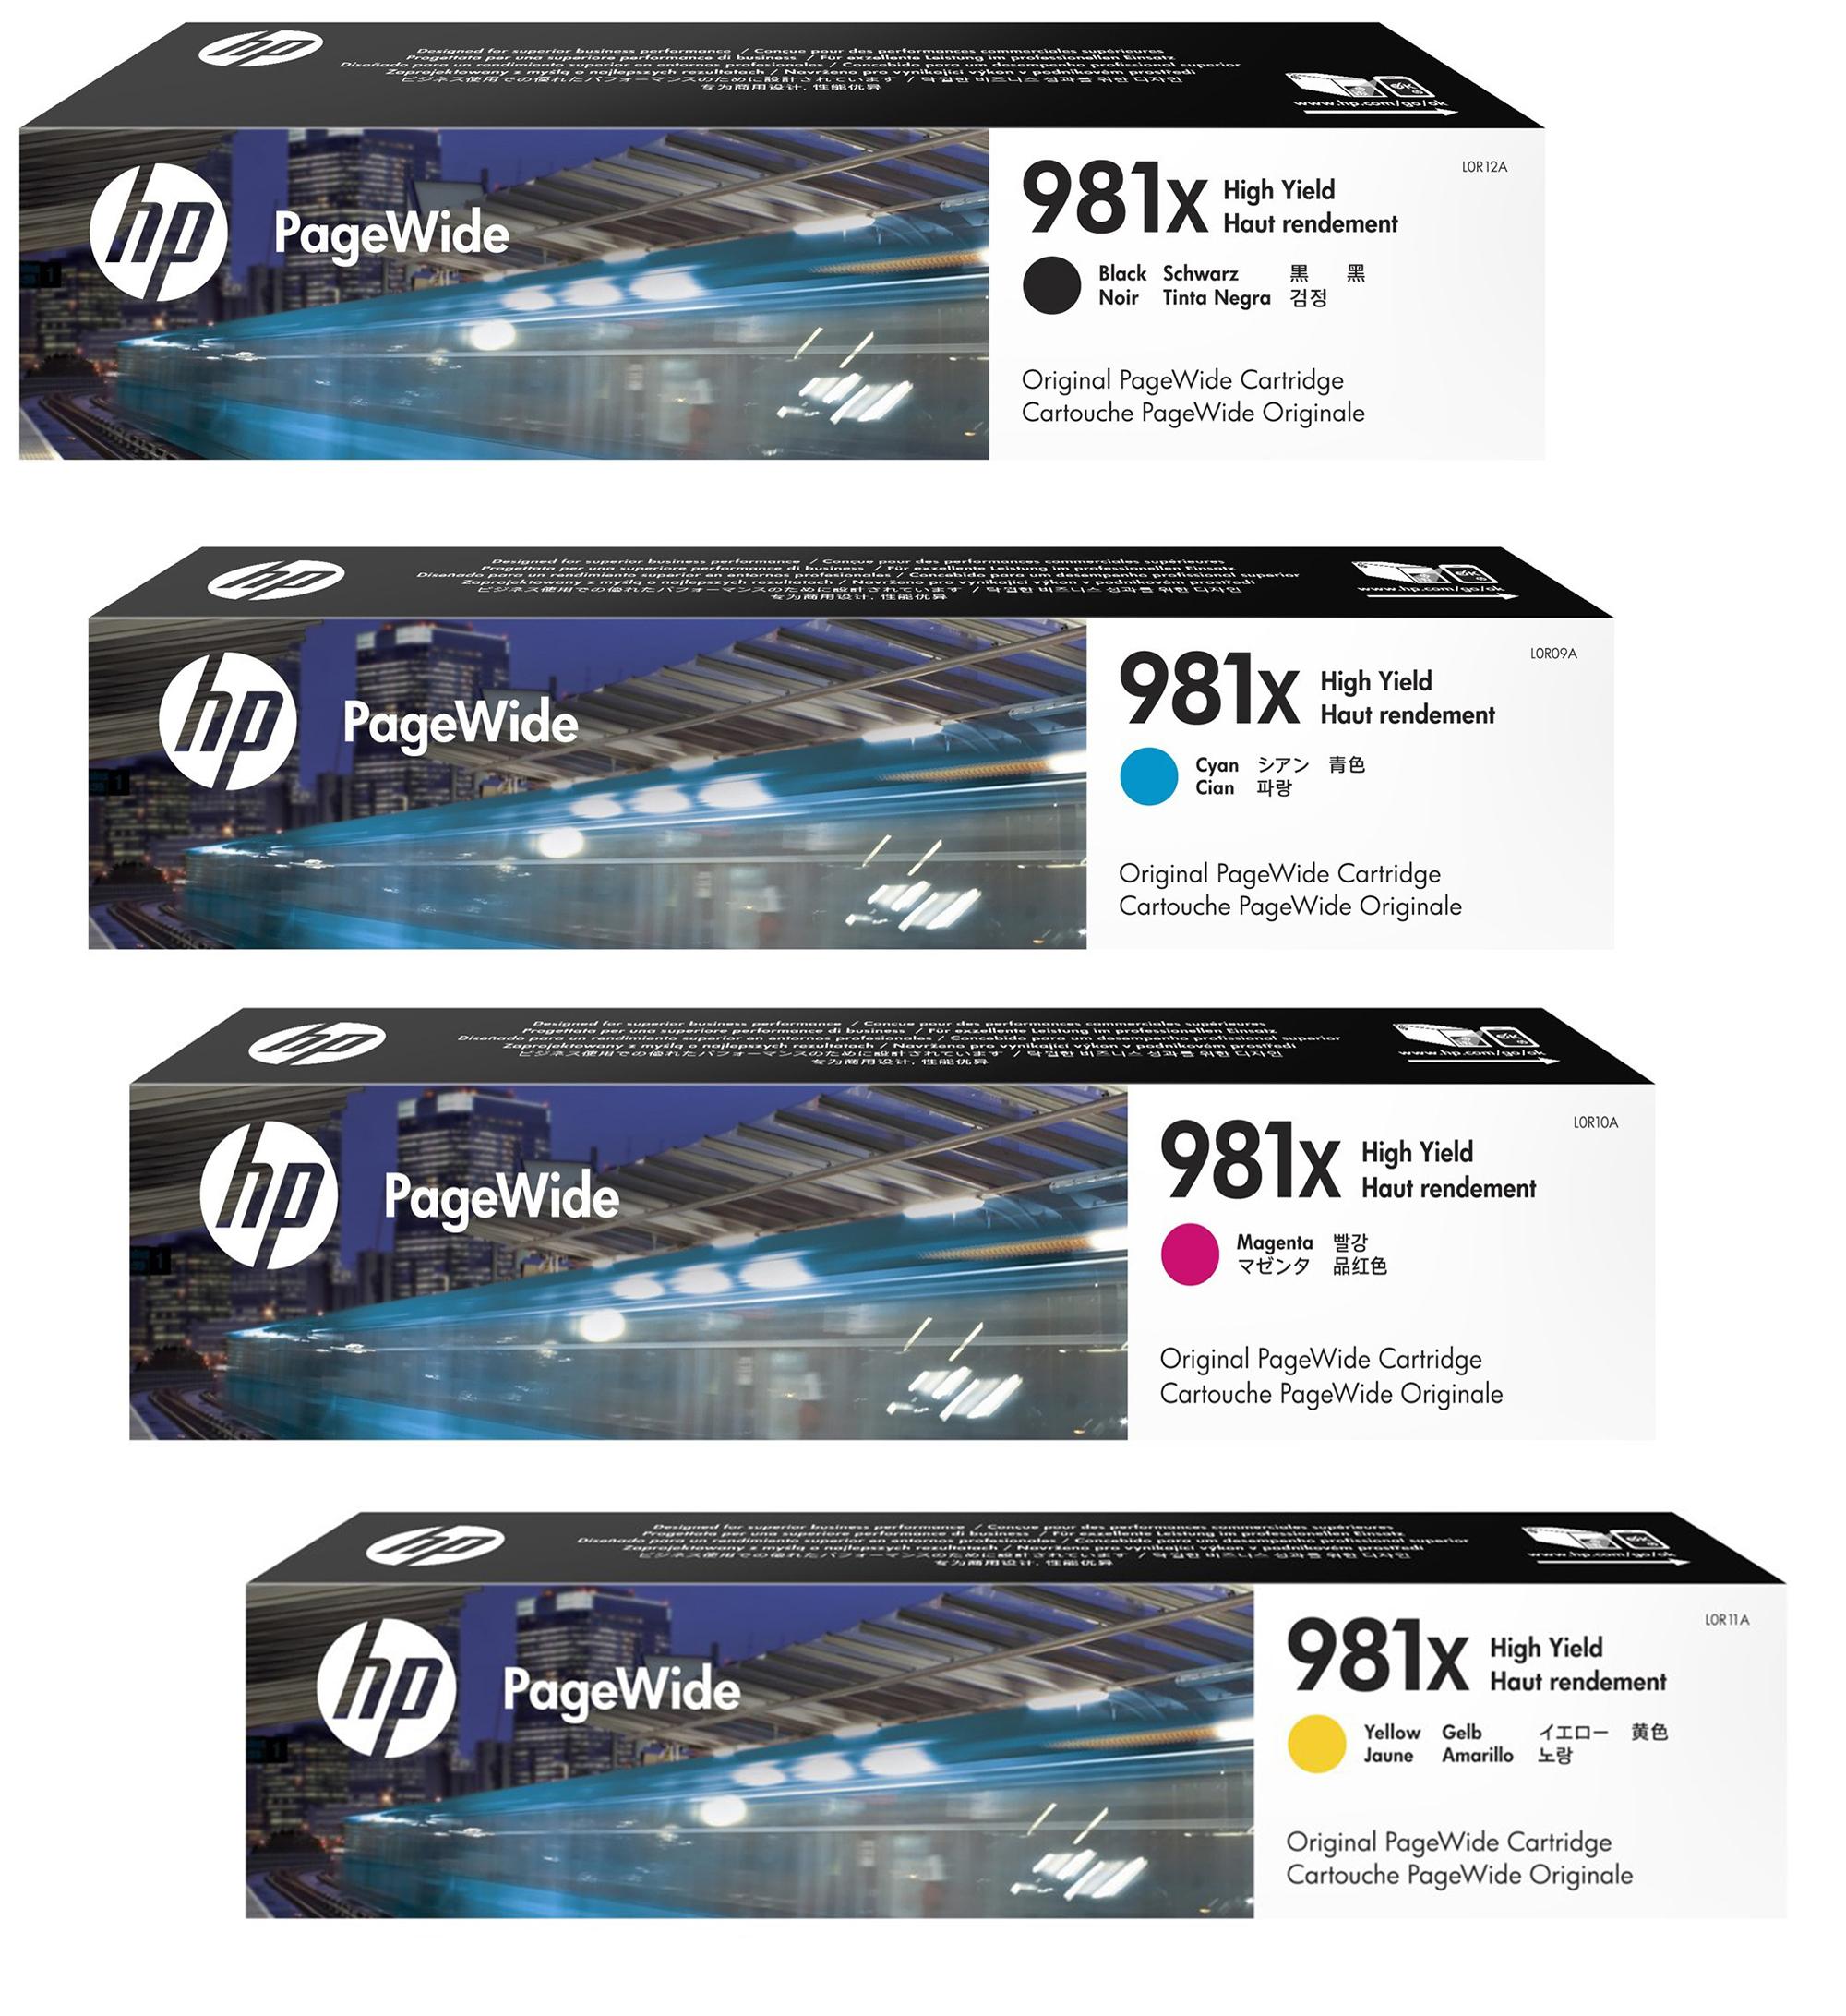 HP 981X Original PageWide Cartridge 4-Color Set,HP L0R12A, L0R09A, L0R10A, L0R11A